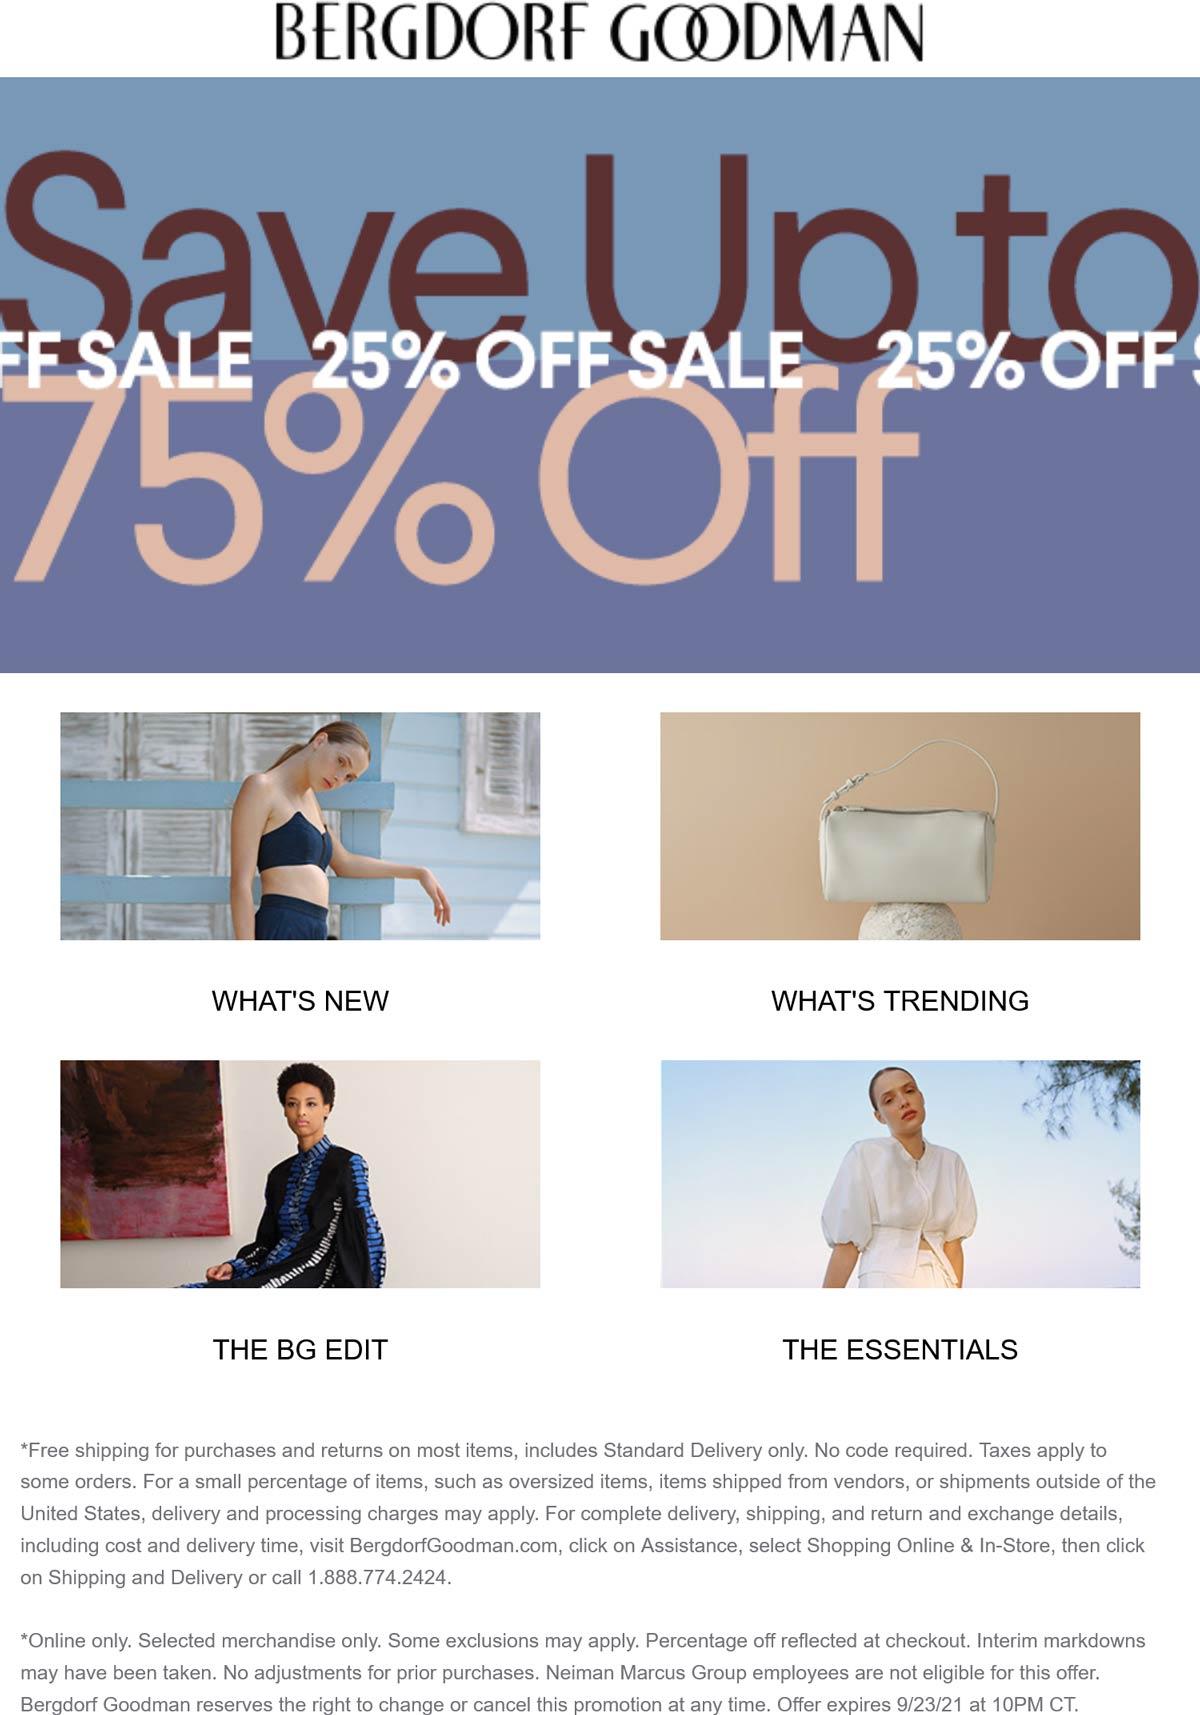 Bergdorf Goodman stores Coupon  Extra 25% off sale items today online at Bergdorf Goodman #bergdorfgoodman